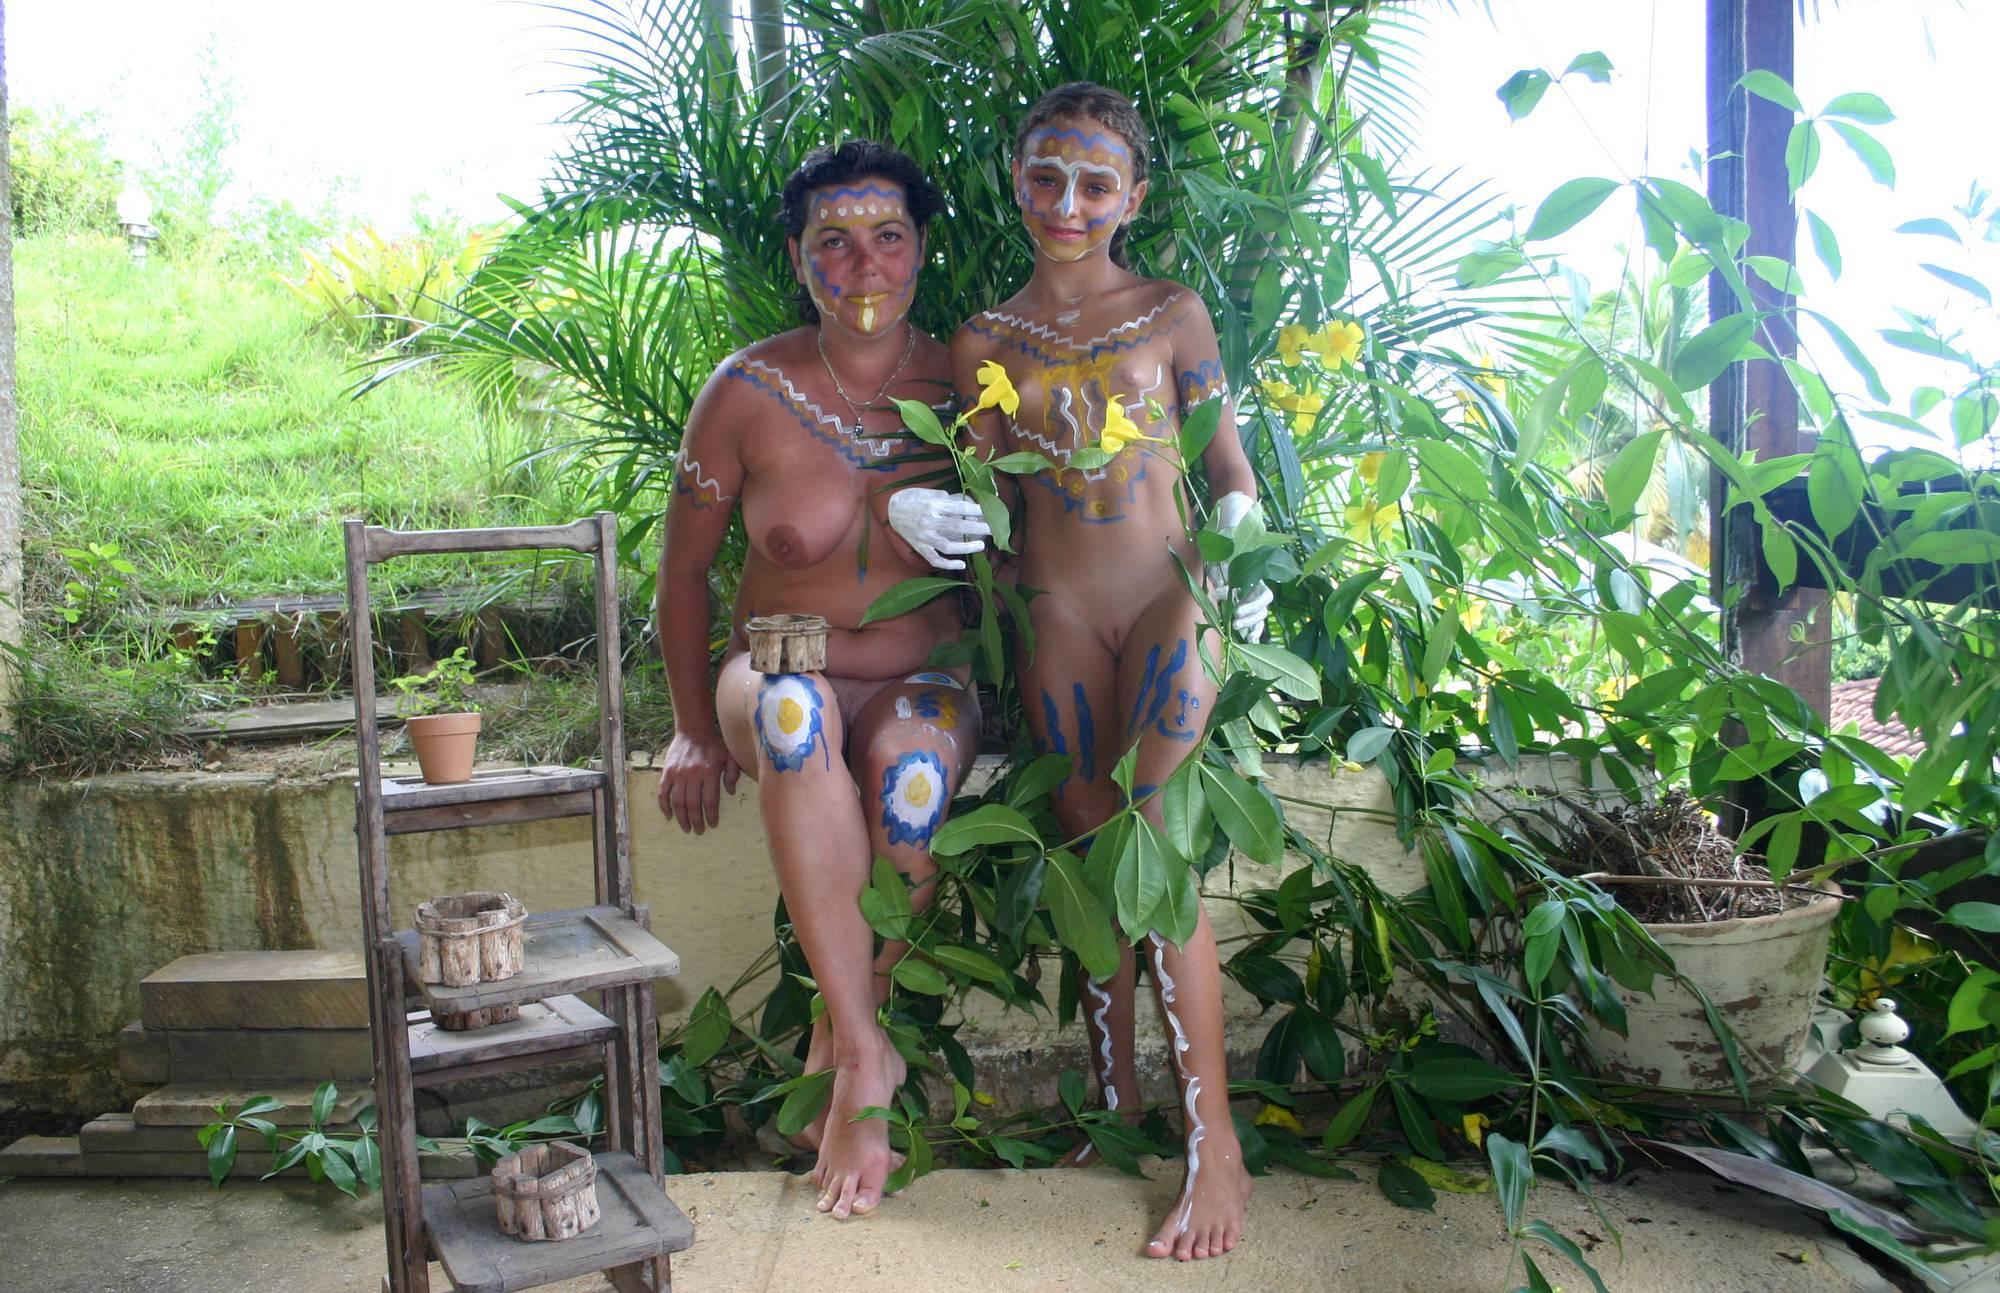 Purenudism Images-Two Nudist Profile Friends - 4